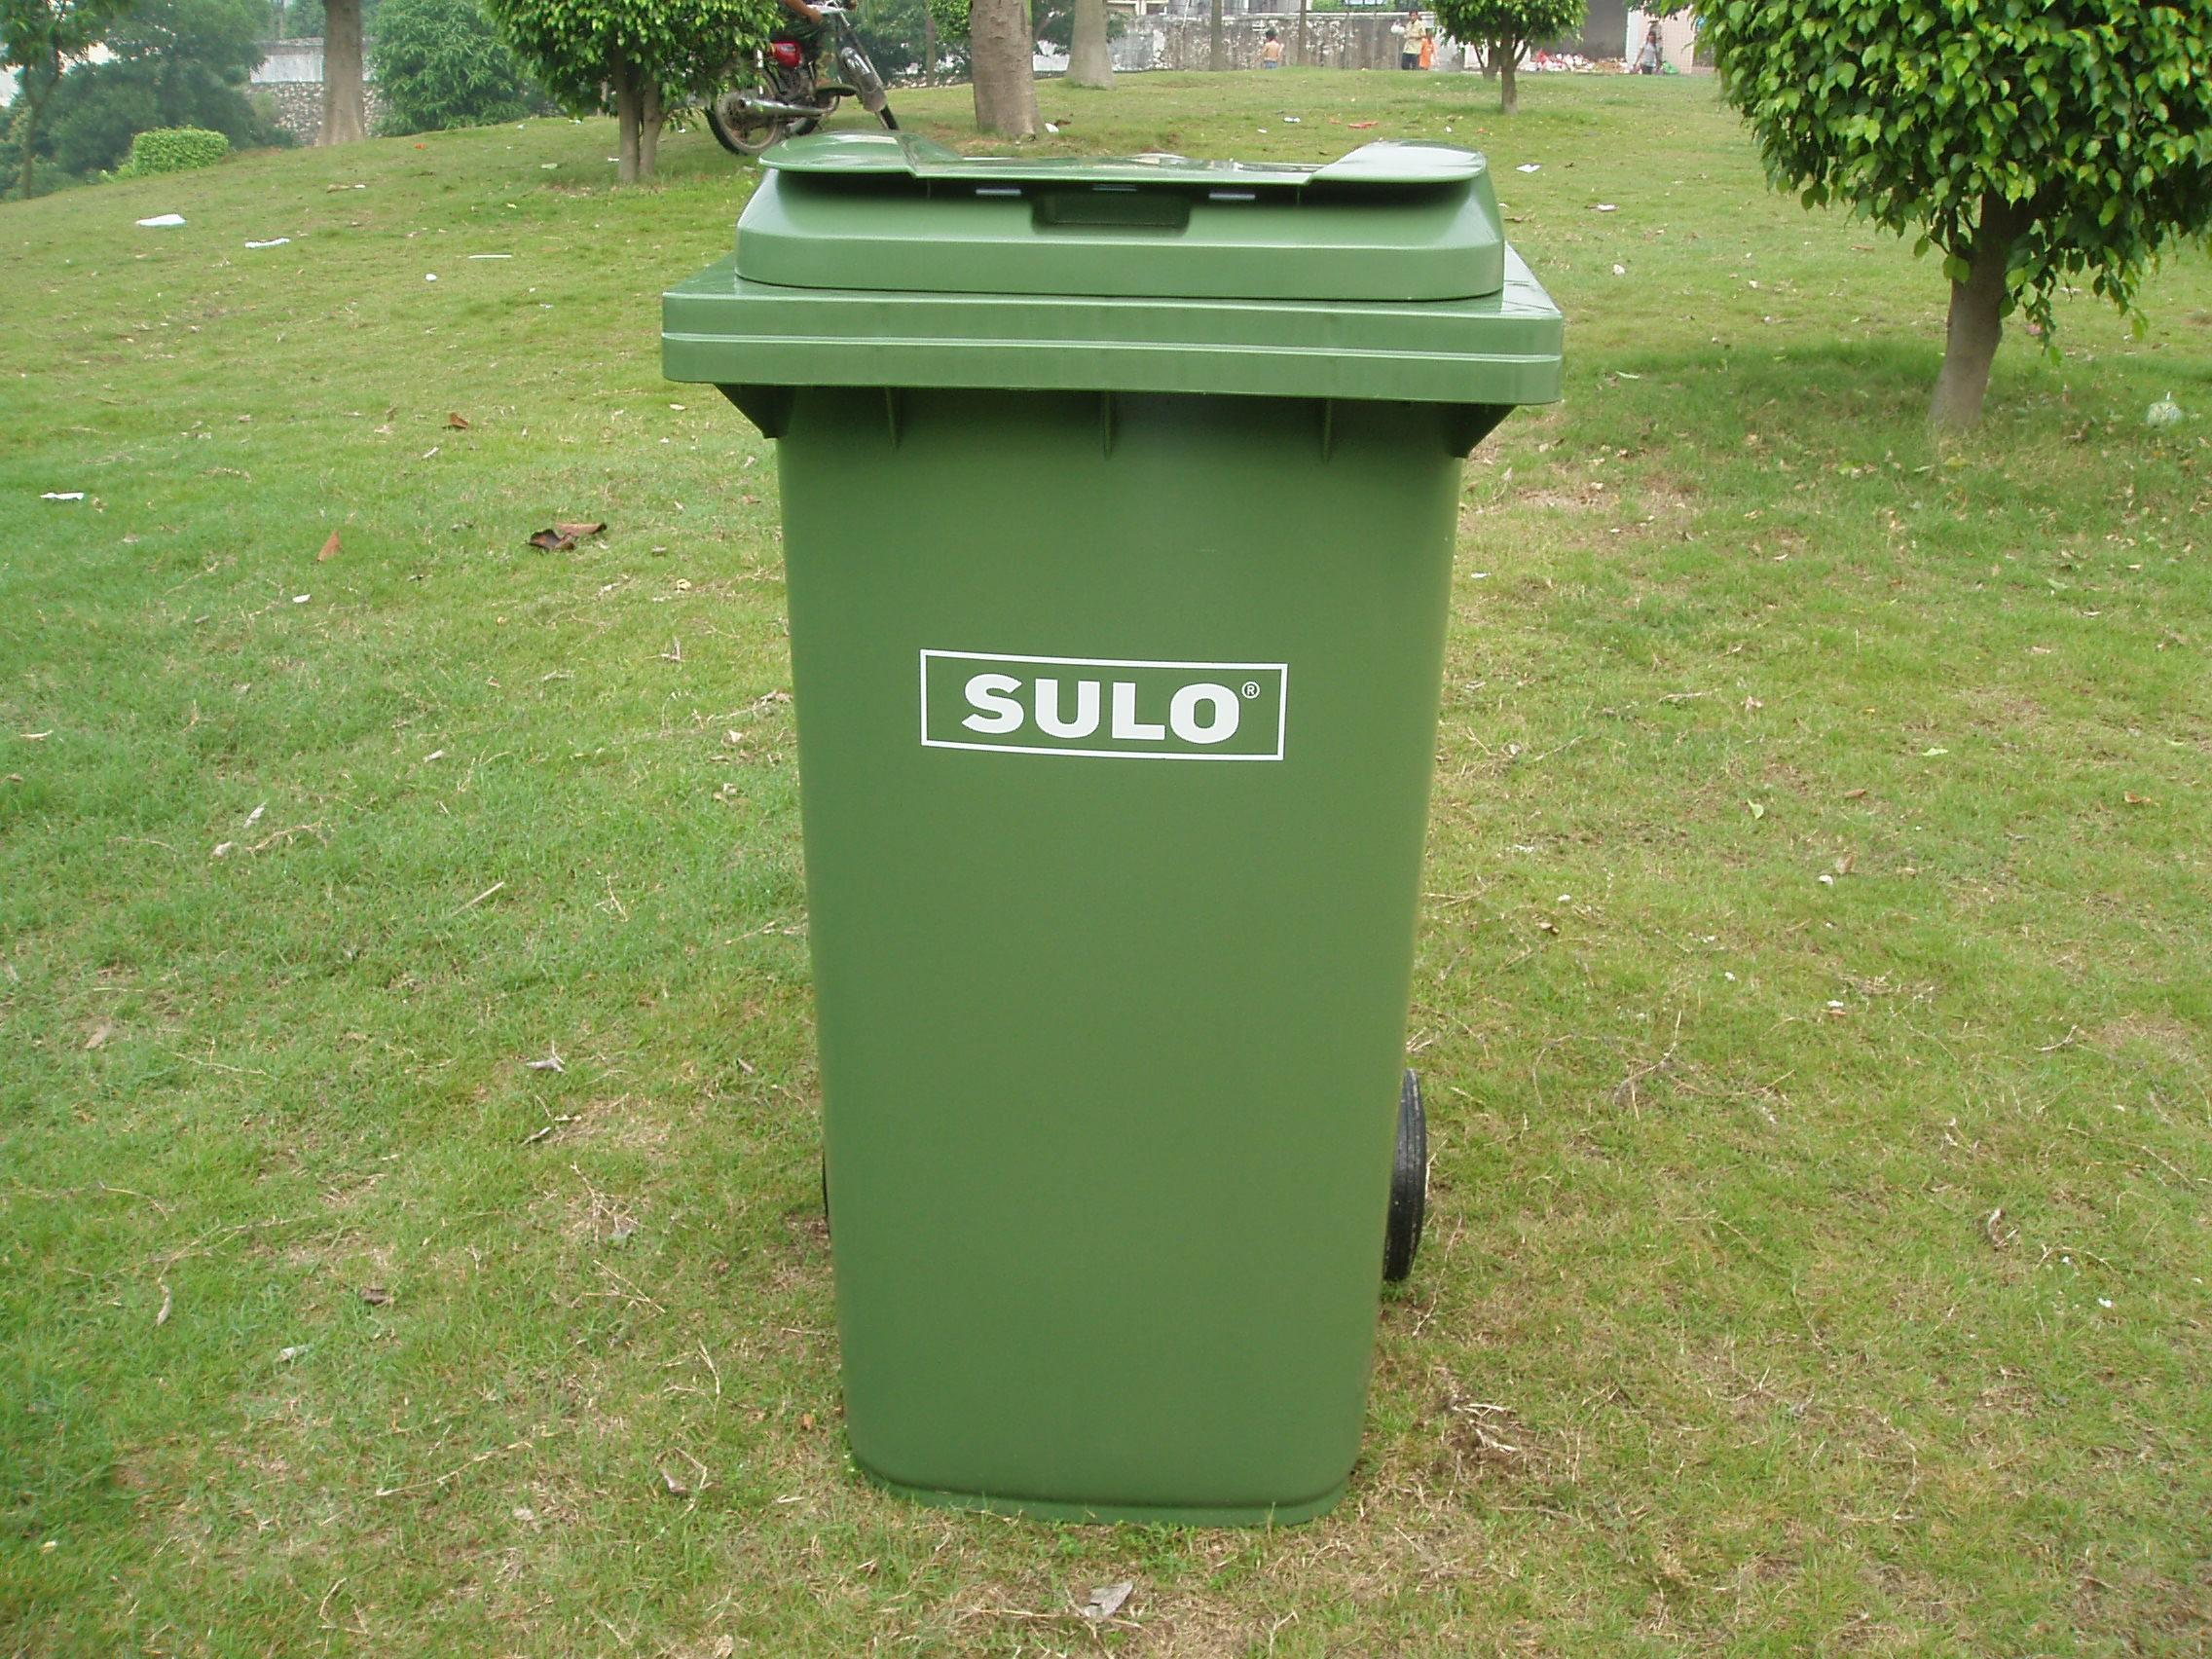 022a进口塑料移动垃圾桶240l